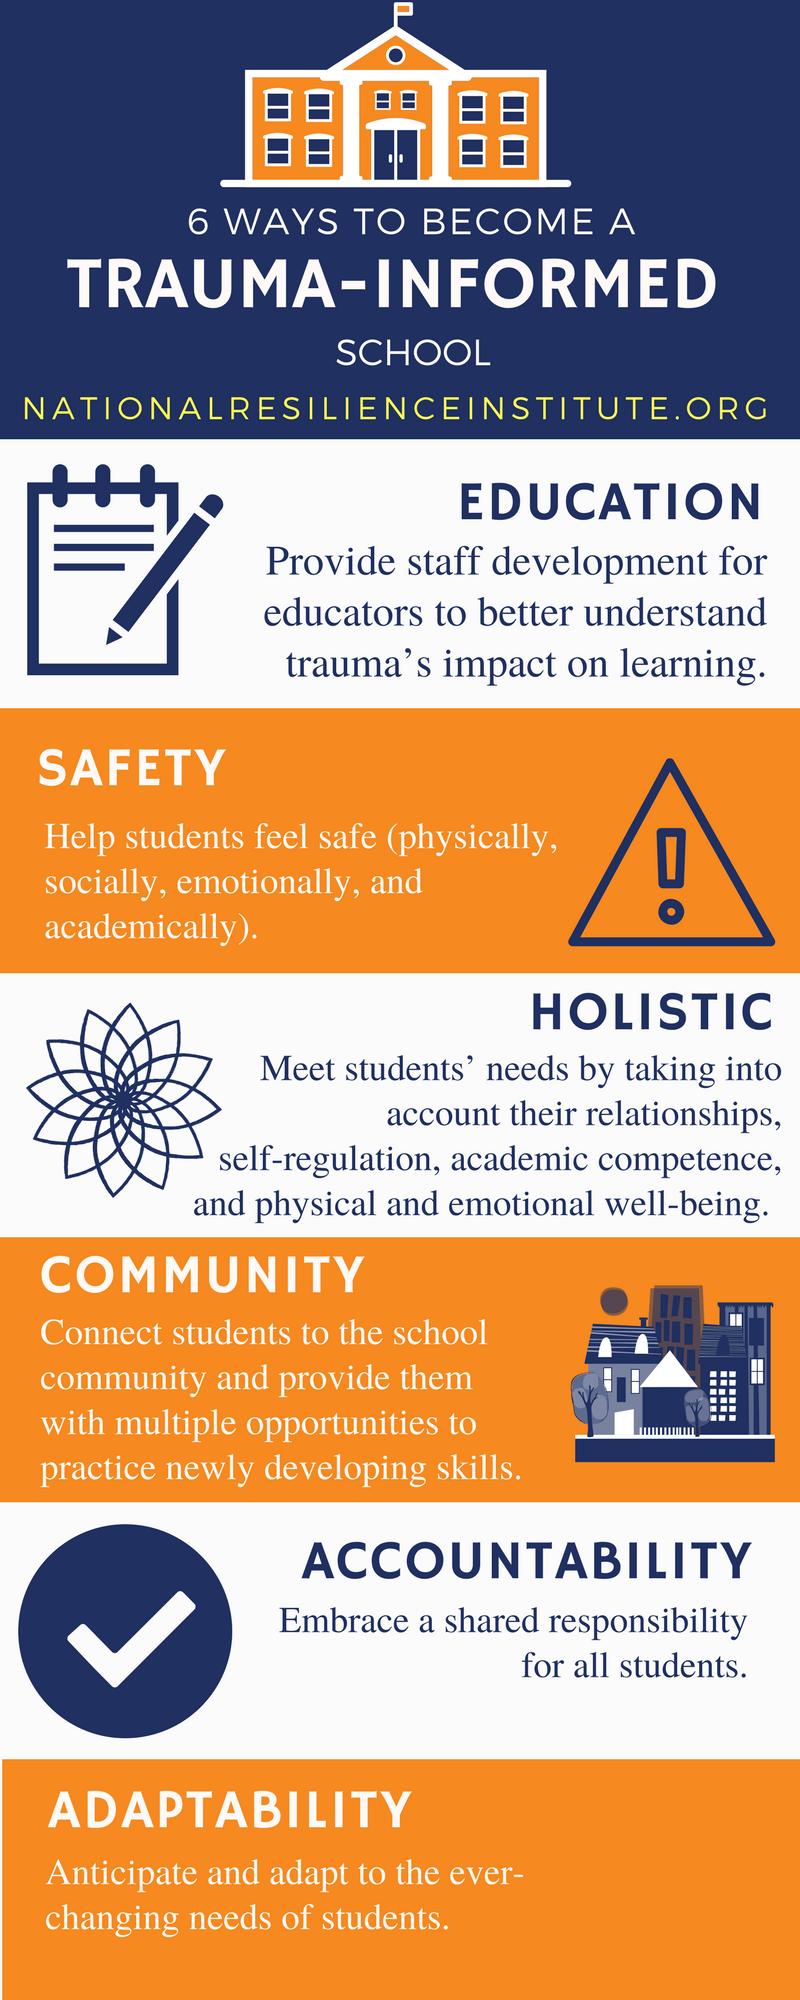 6 ways to become trauma informed school